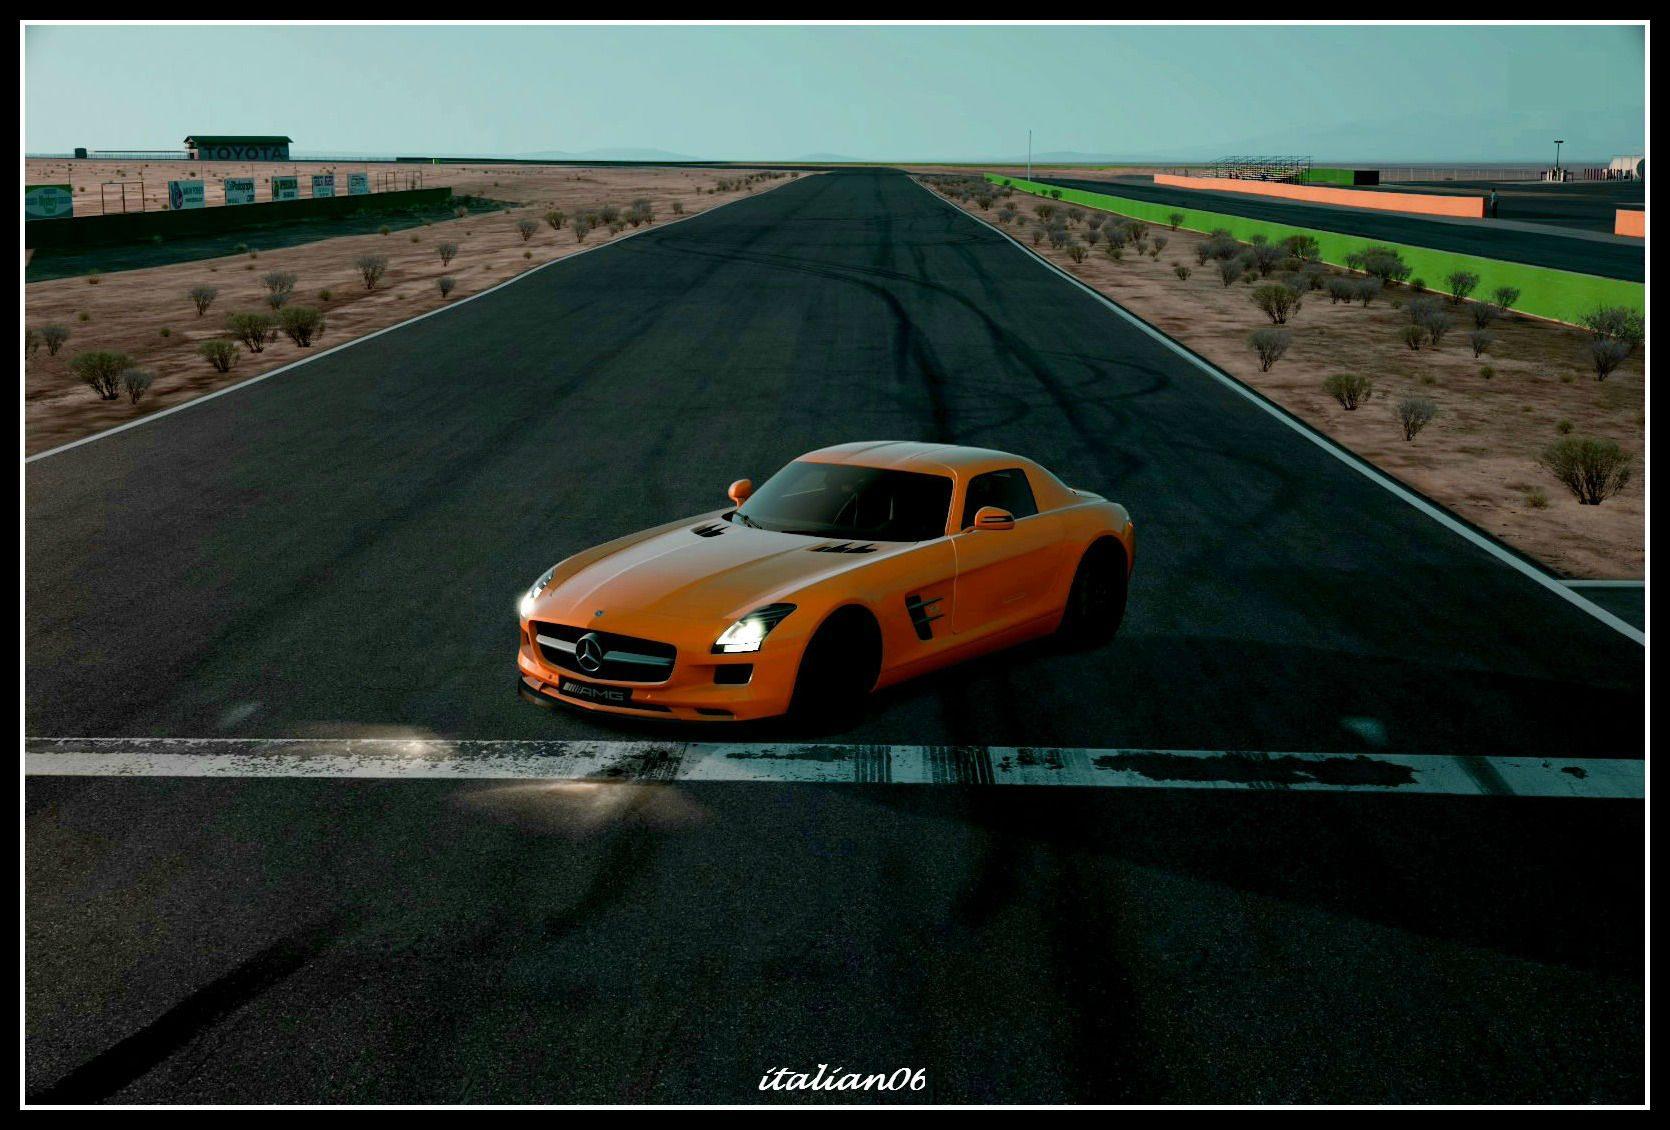 Willow Springs International Raceway_ Big Willow_1 Edited.jpg